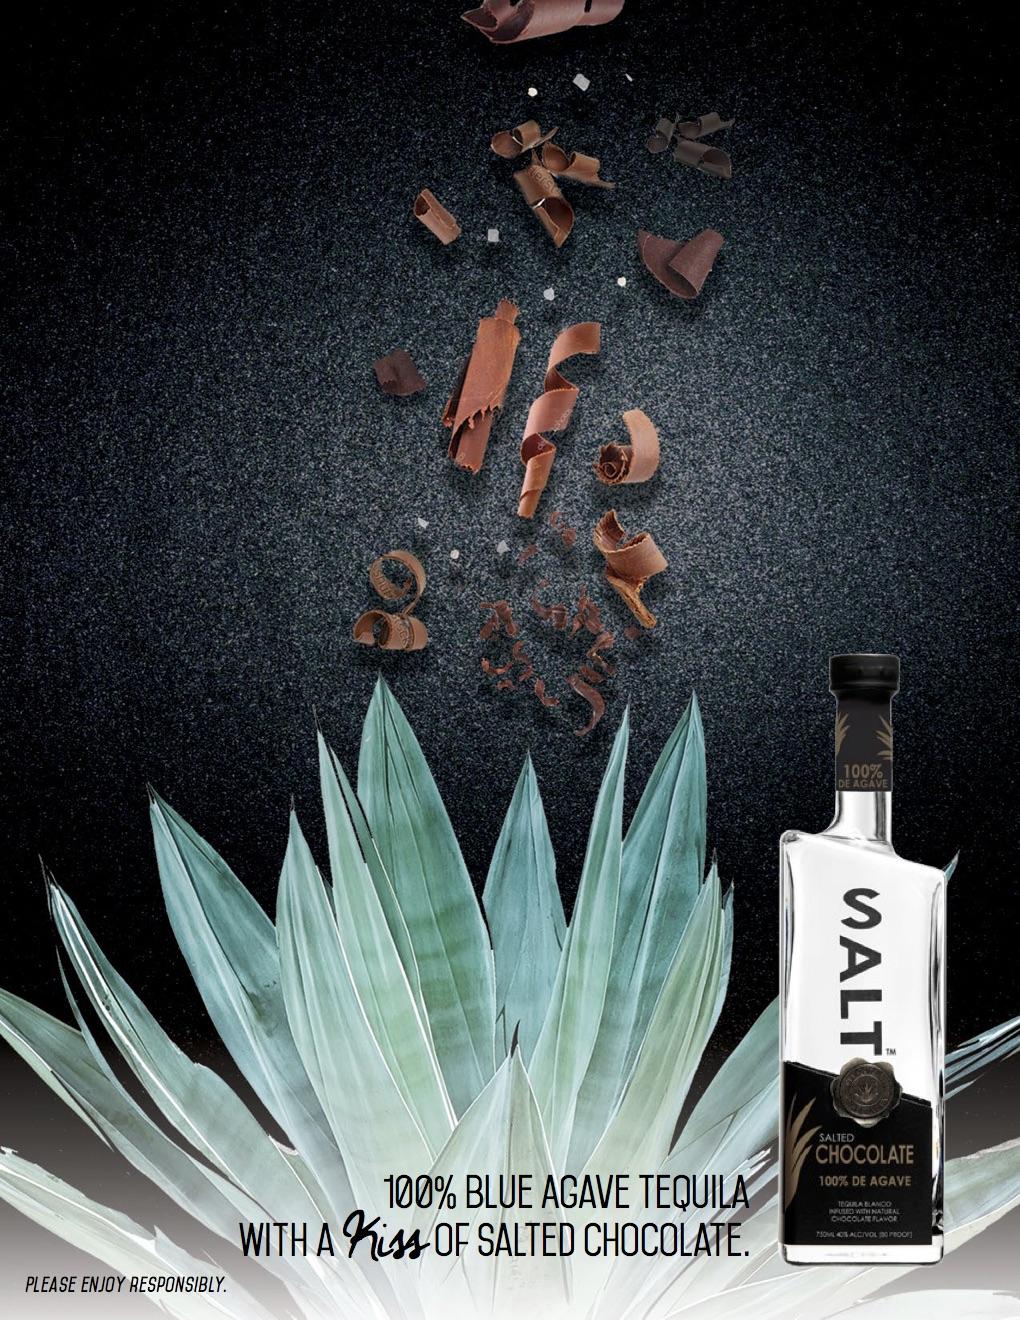 SALT_Tequila_Agave_R3 1.jpg